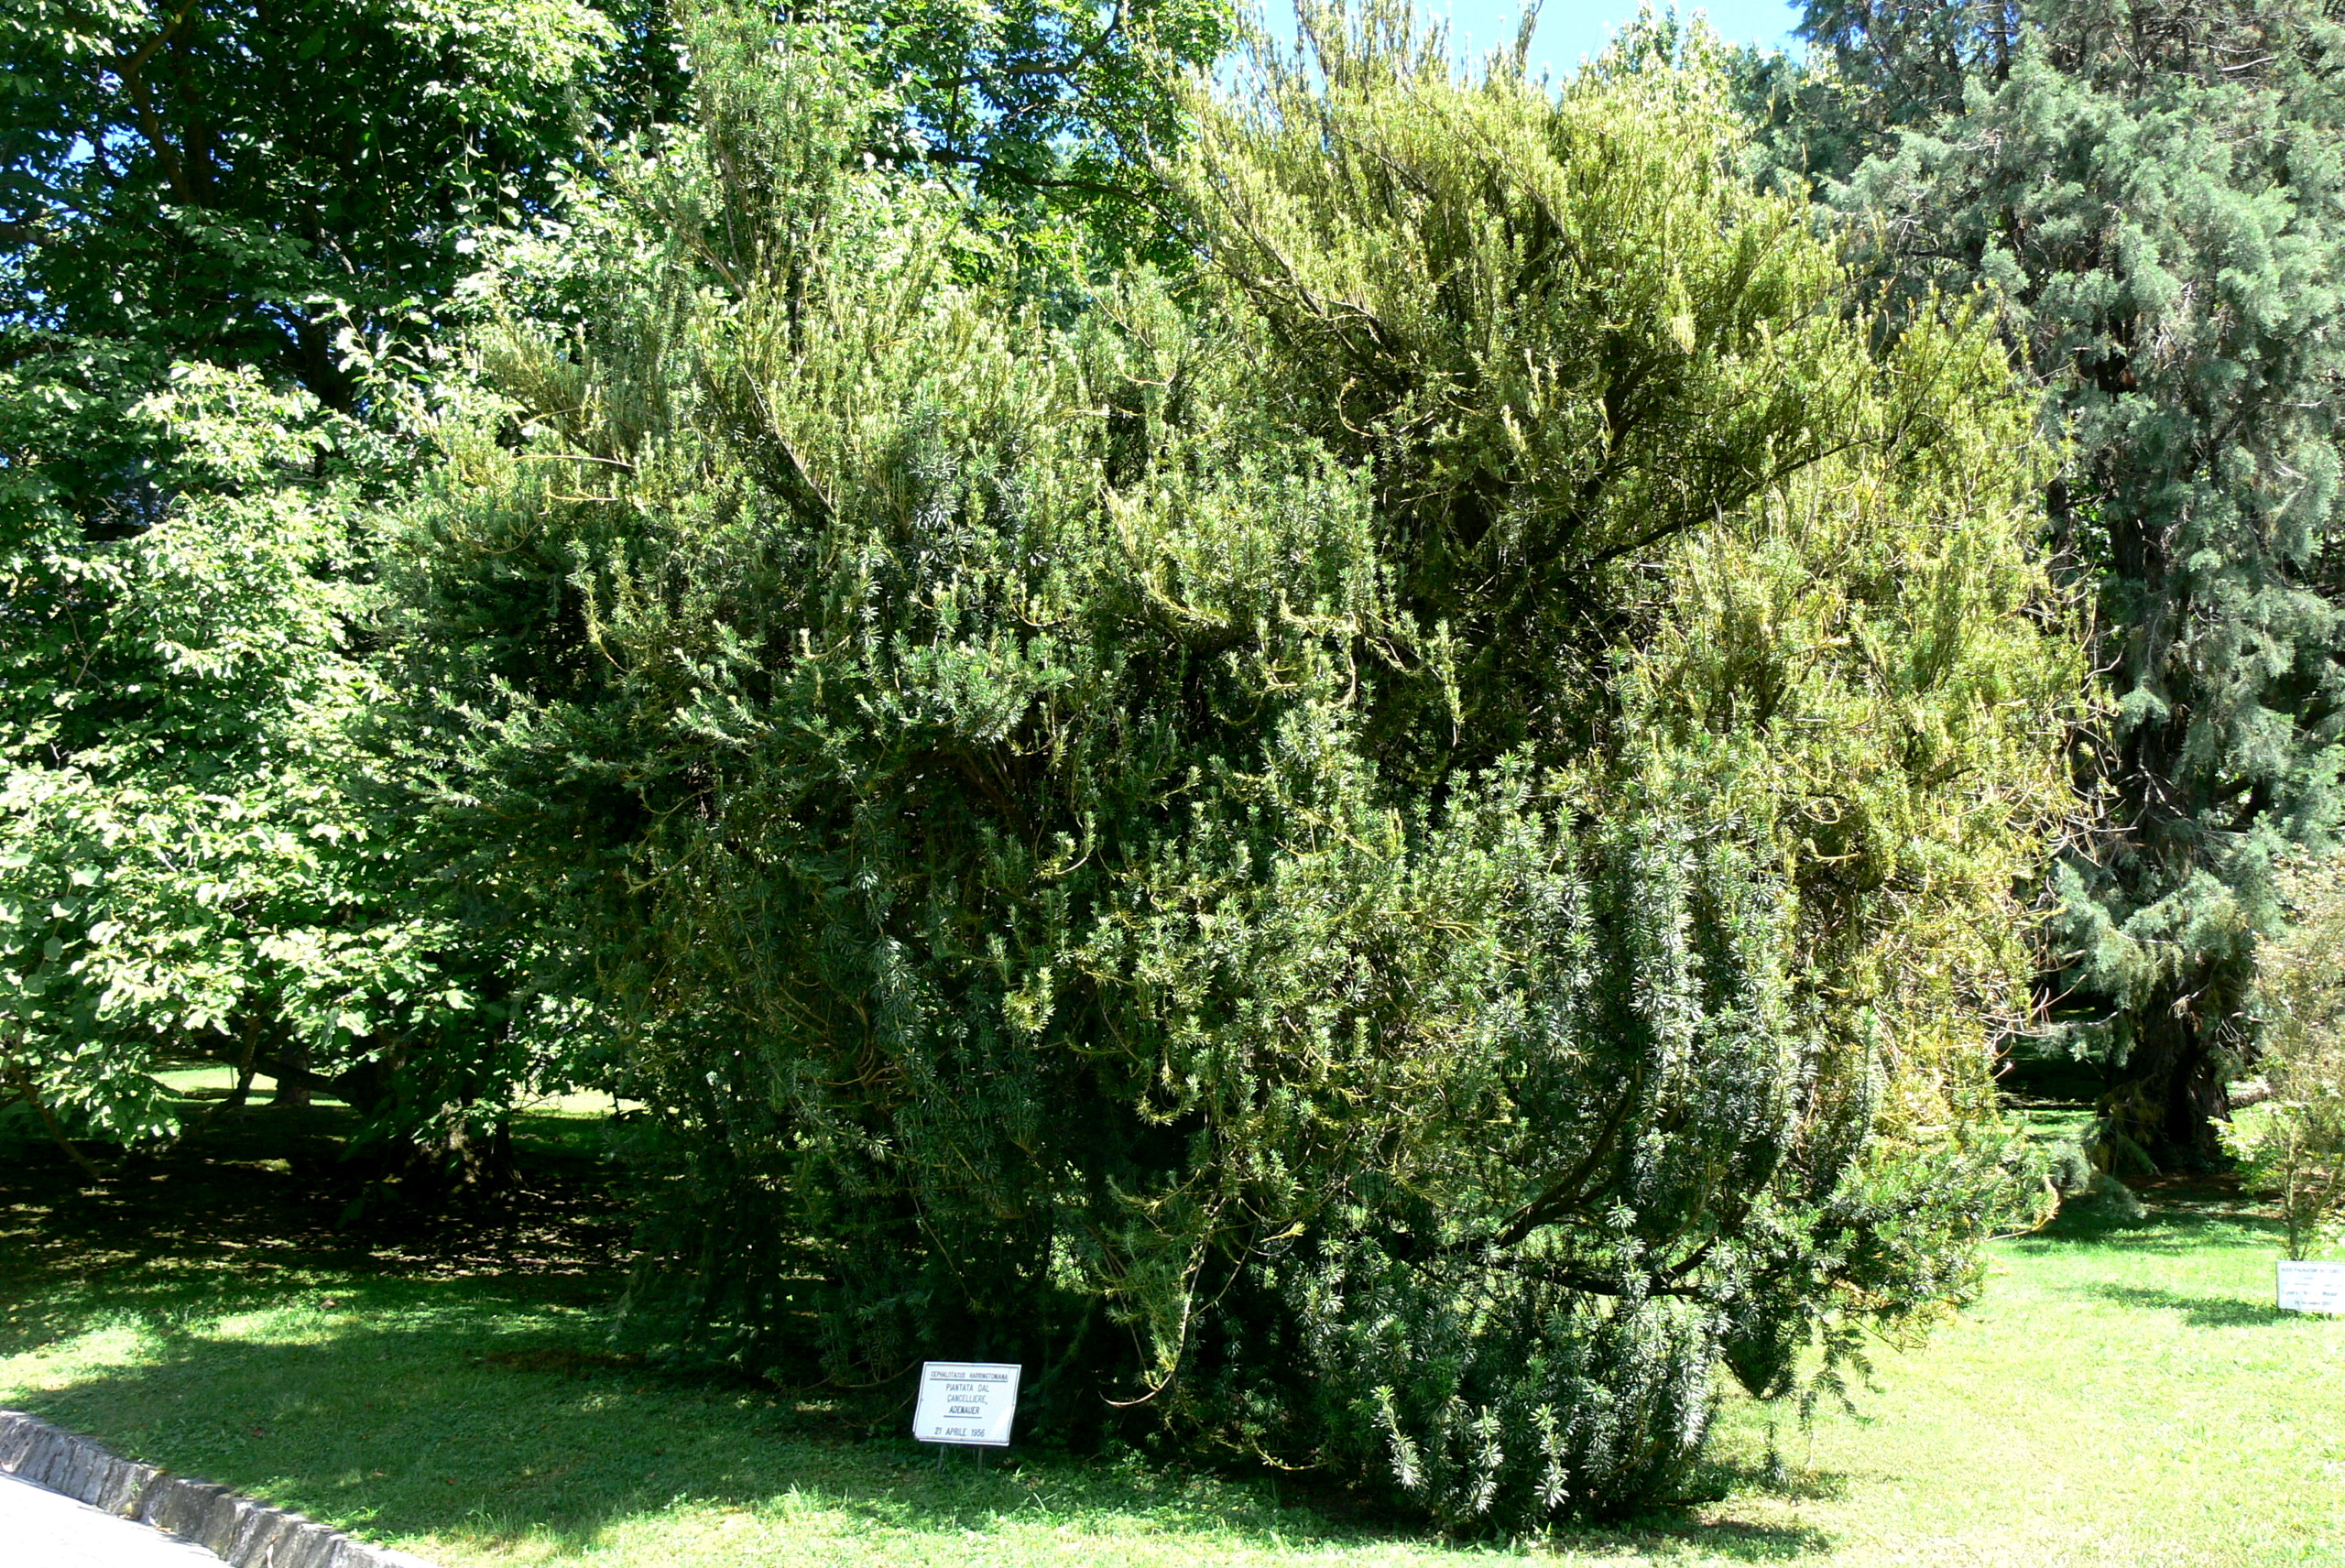 Datei villa taranto cephalotaxus wikipedia for Cephalotaxus harringtonia duke gardens